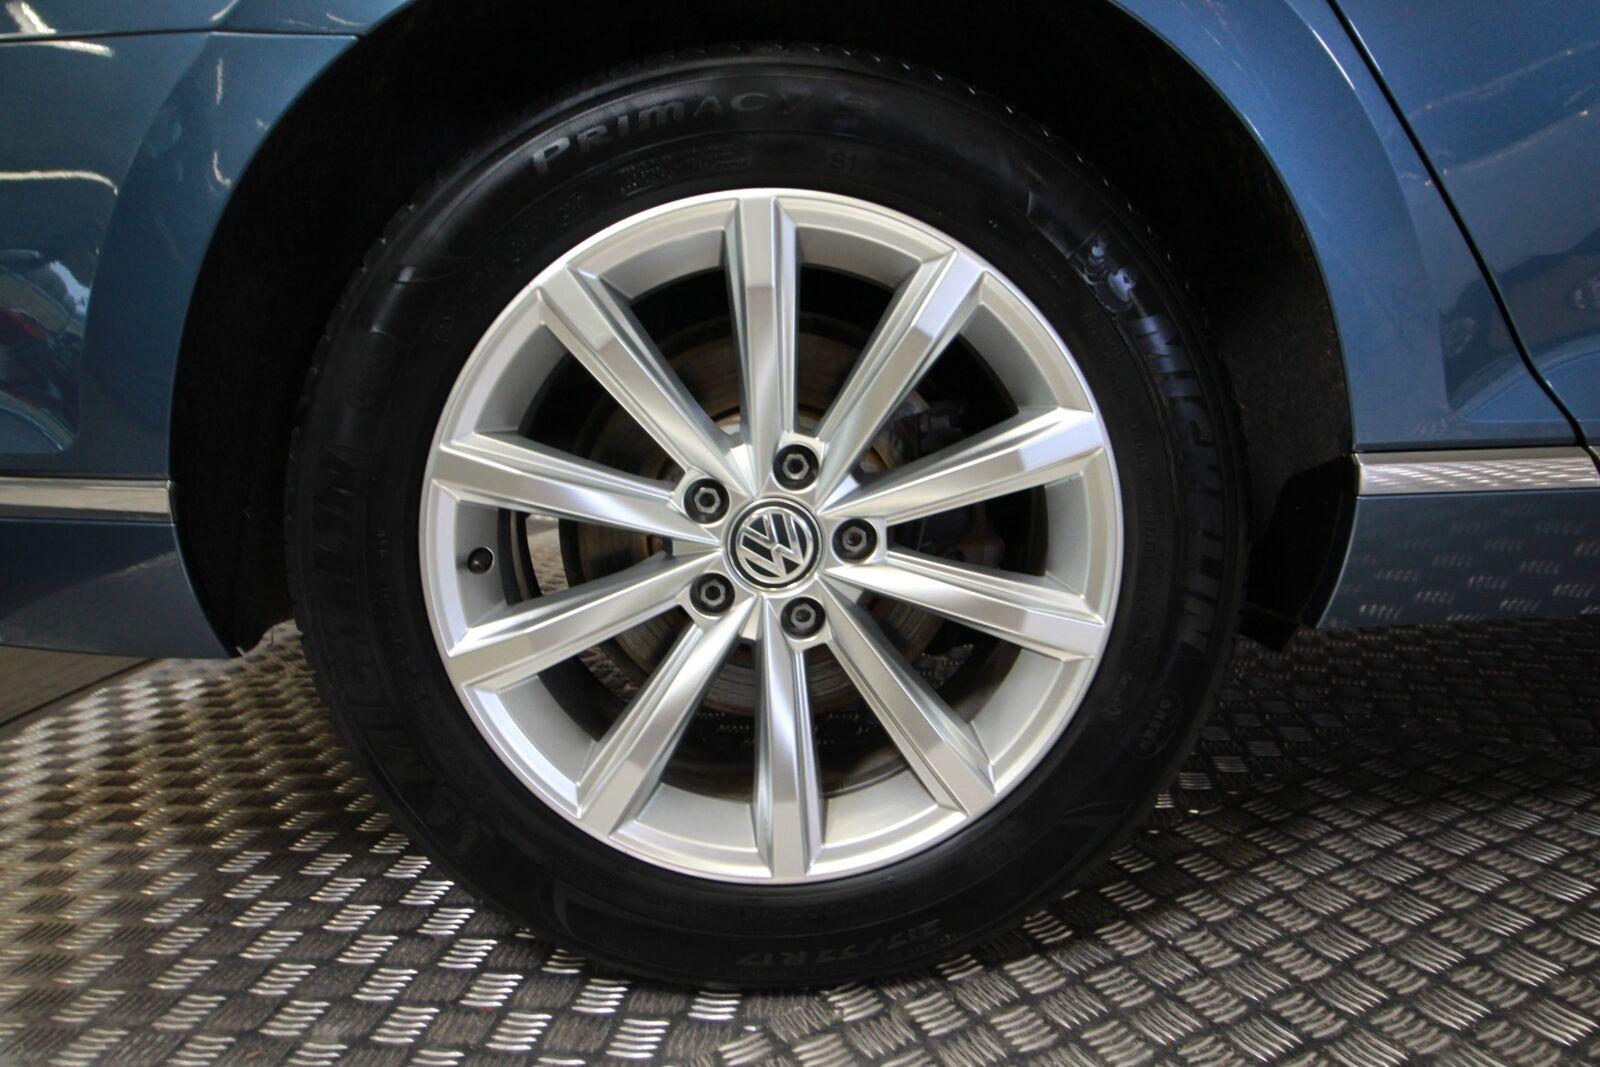 VW Passat TDi 150 Highl. Prem. Vari. DSG